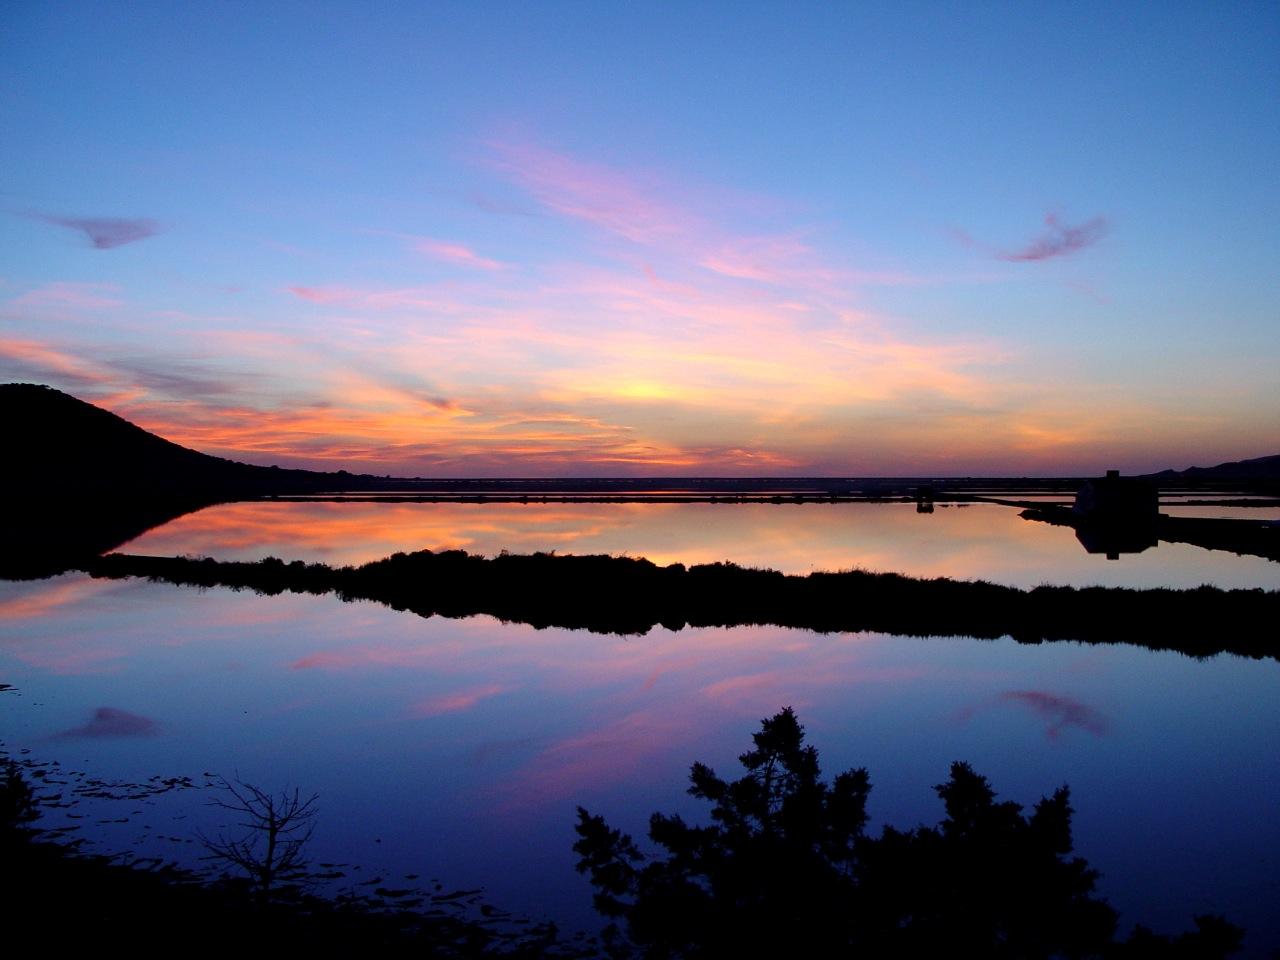 https://www.white-ibiza.com/wp-content/uploads/2020/03/white-ibiza-sunsets-coricancha-2020-02.jpg